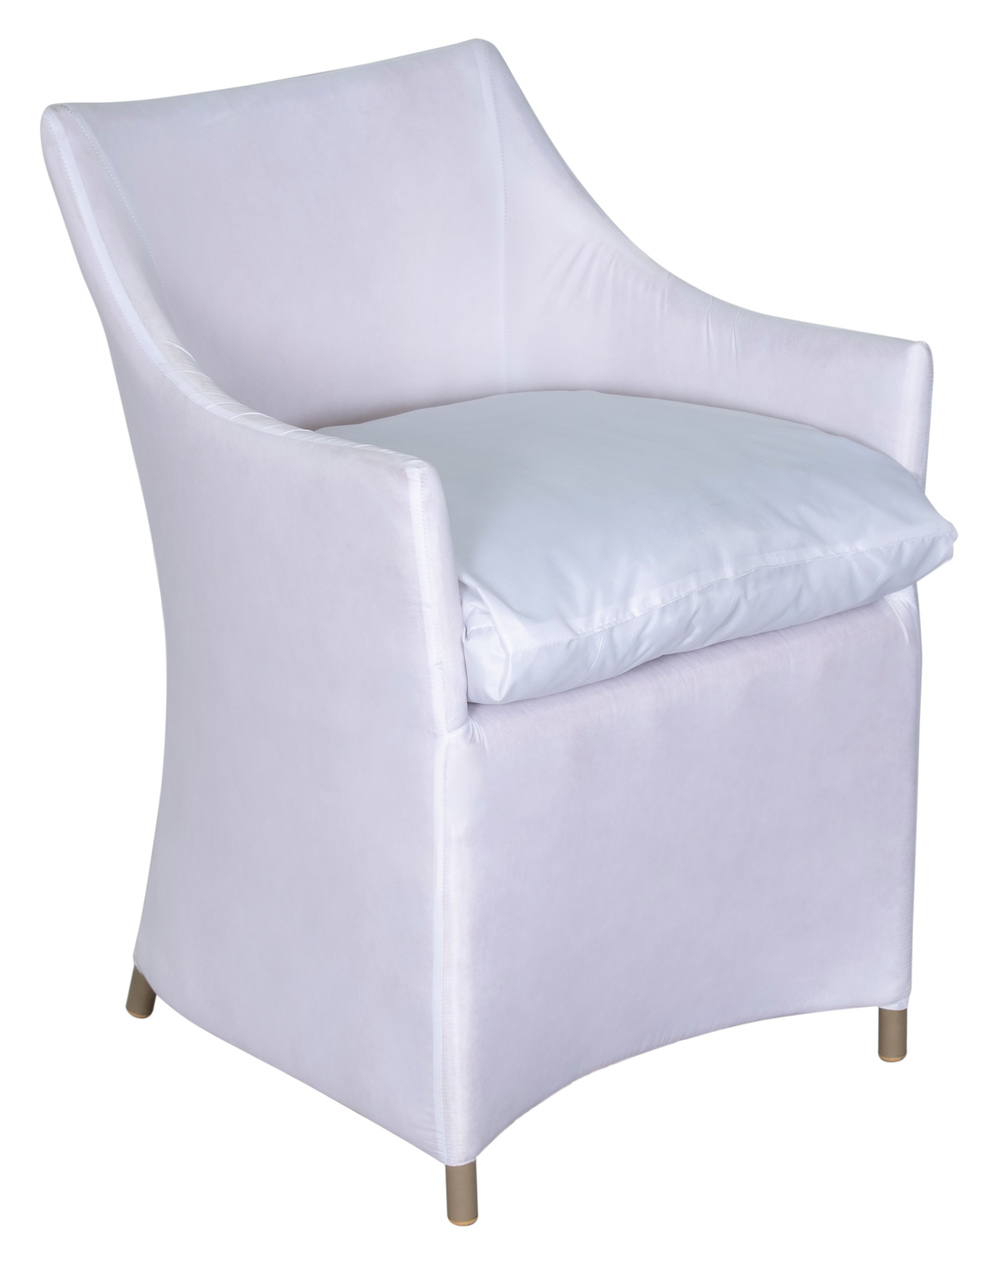 Seasonal Living - Capri Dining Chair, Set/2